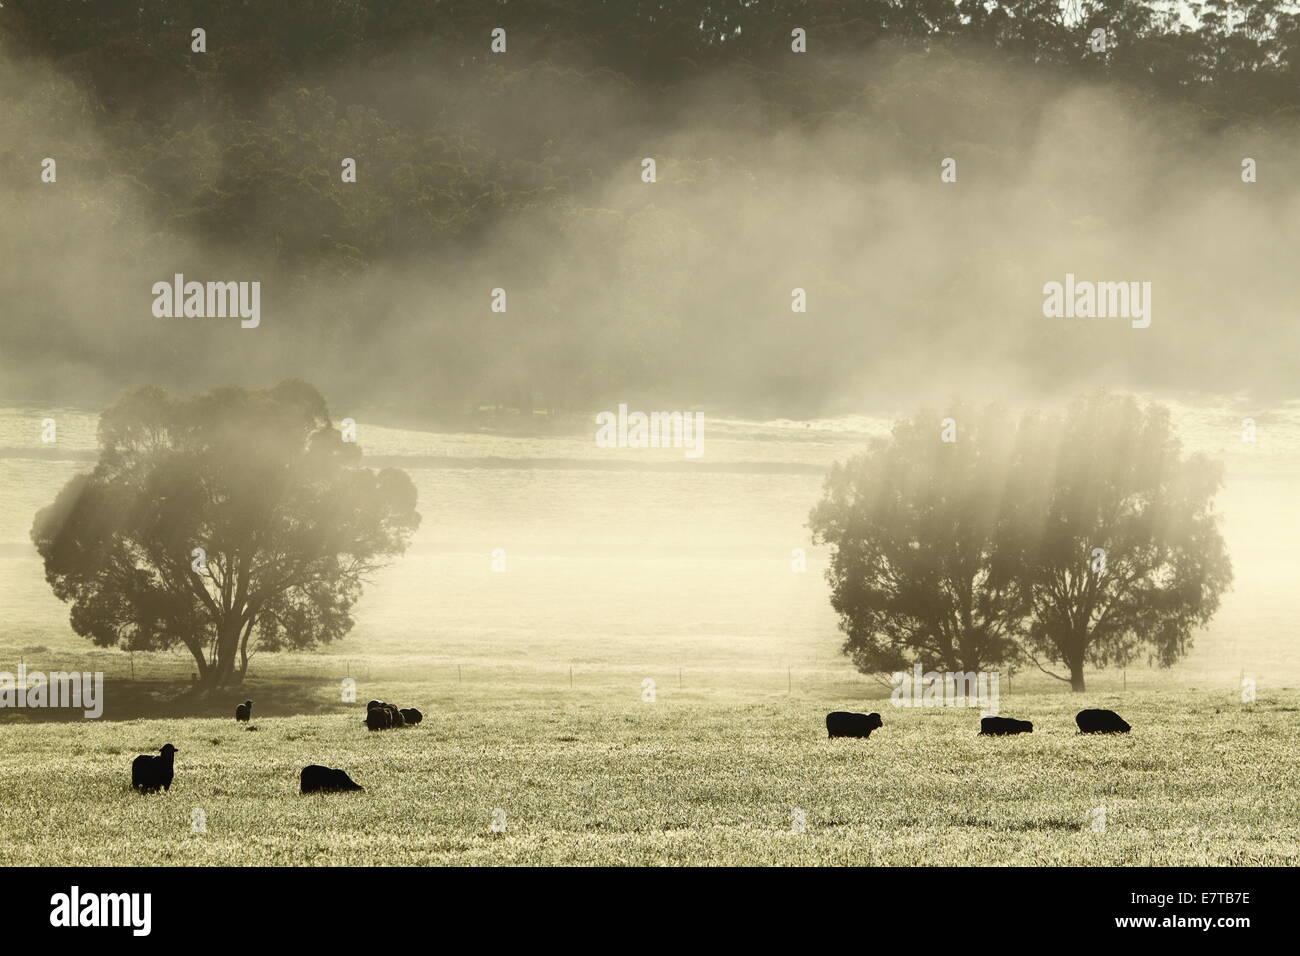 Merino sheep grazing among a foggy landscape in Western Australia. - Stock Image